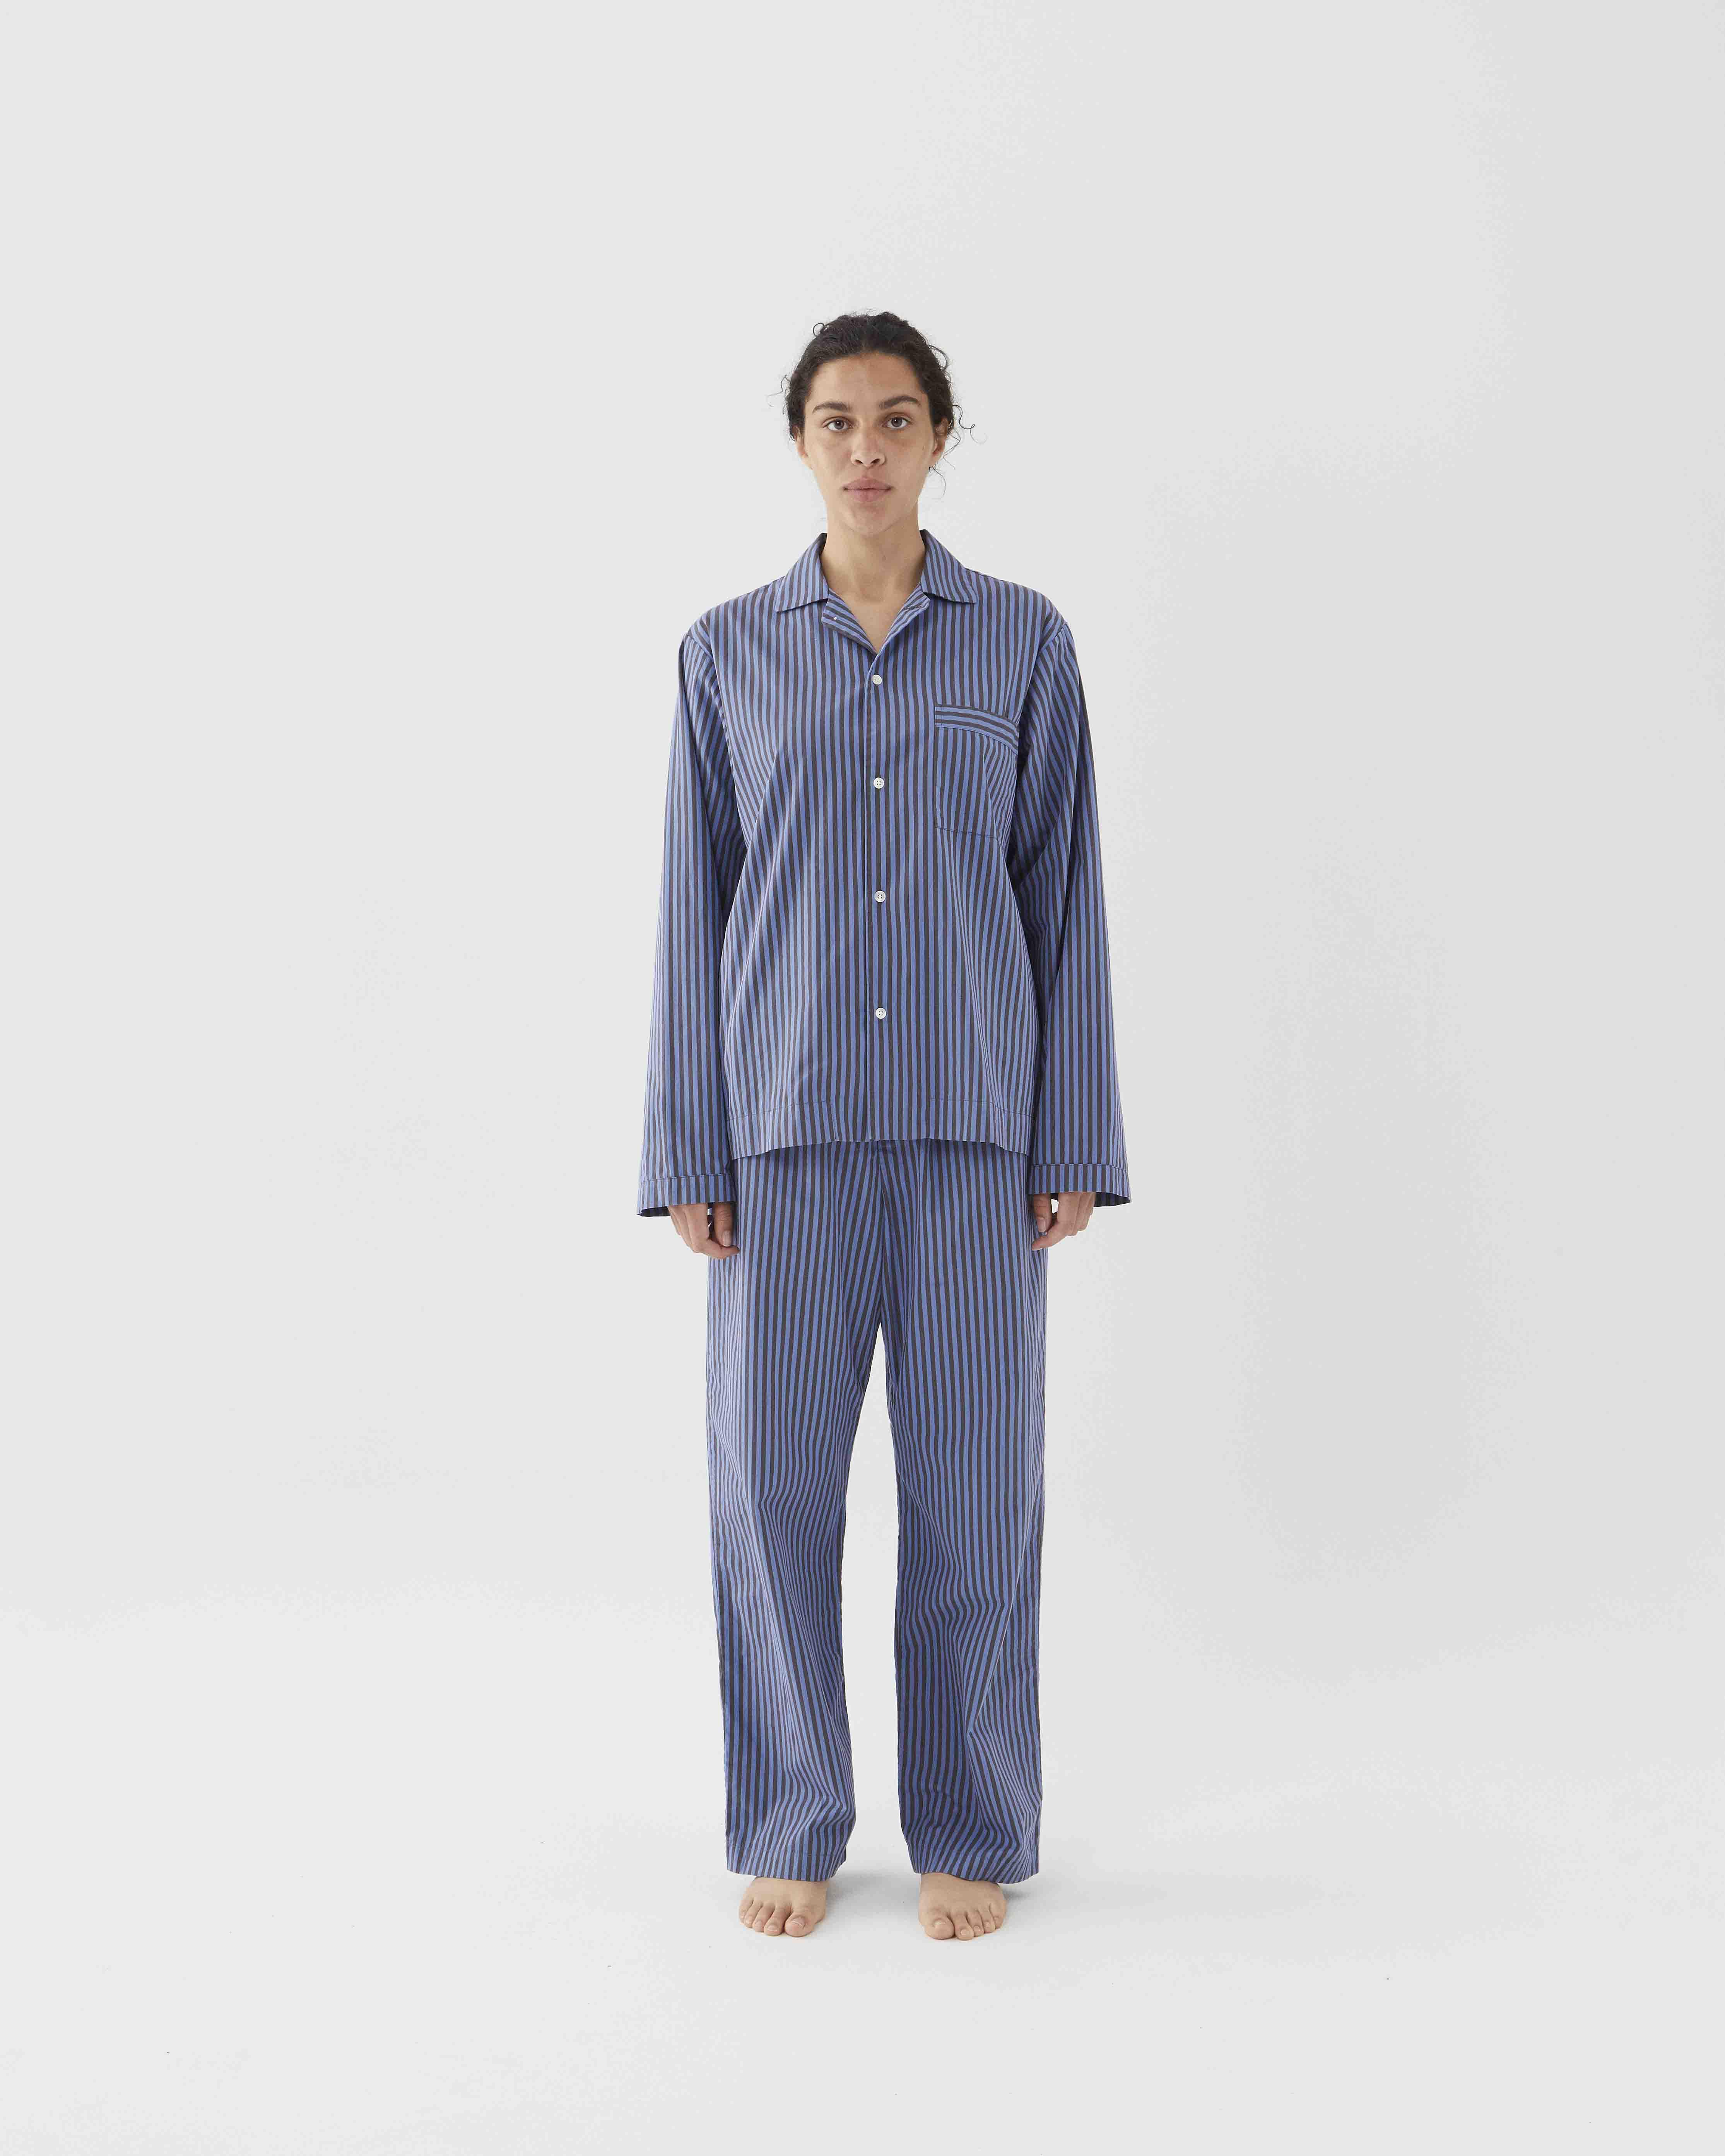 Tekla Sleepwear Verneuil stripes